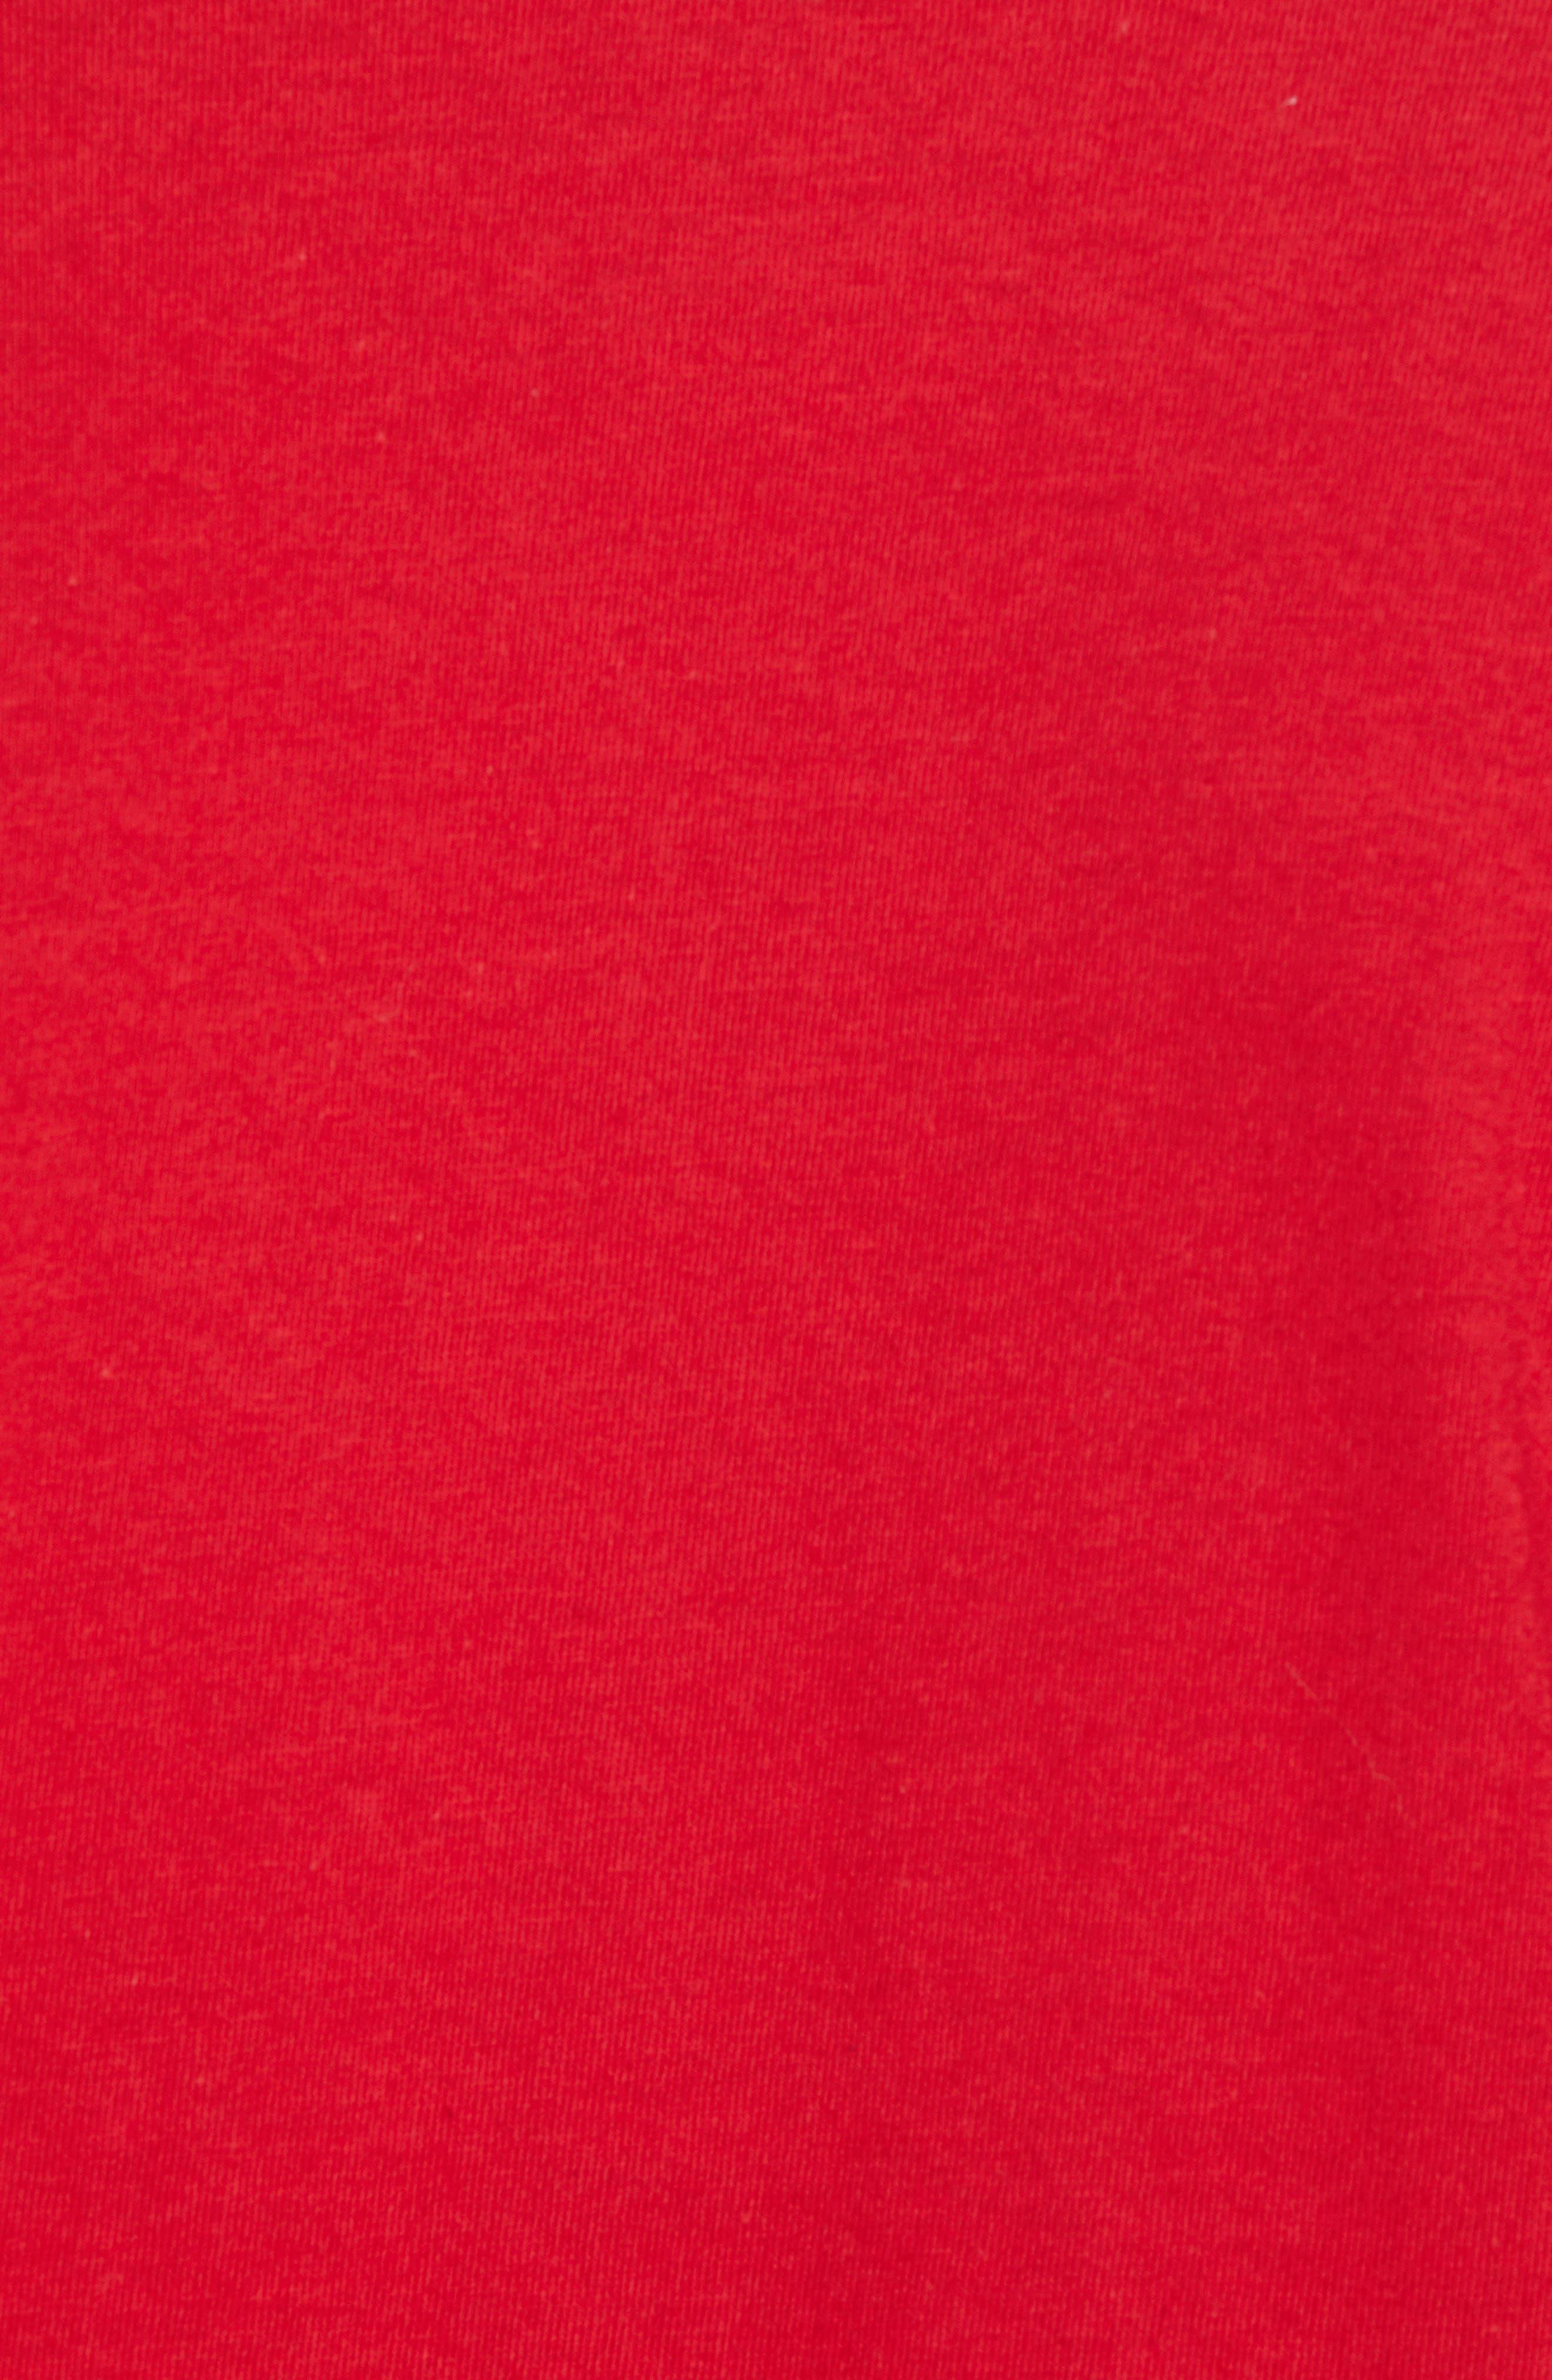 x Marvel<sup>®</sup> Iron Man T-Shirt,                             Alternate thumbnail 5, color,                             601